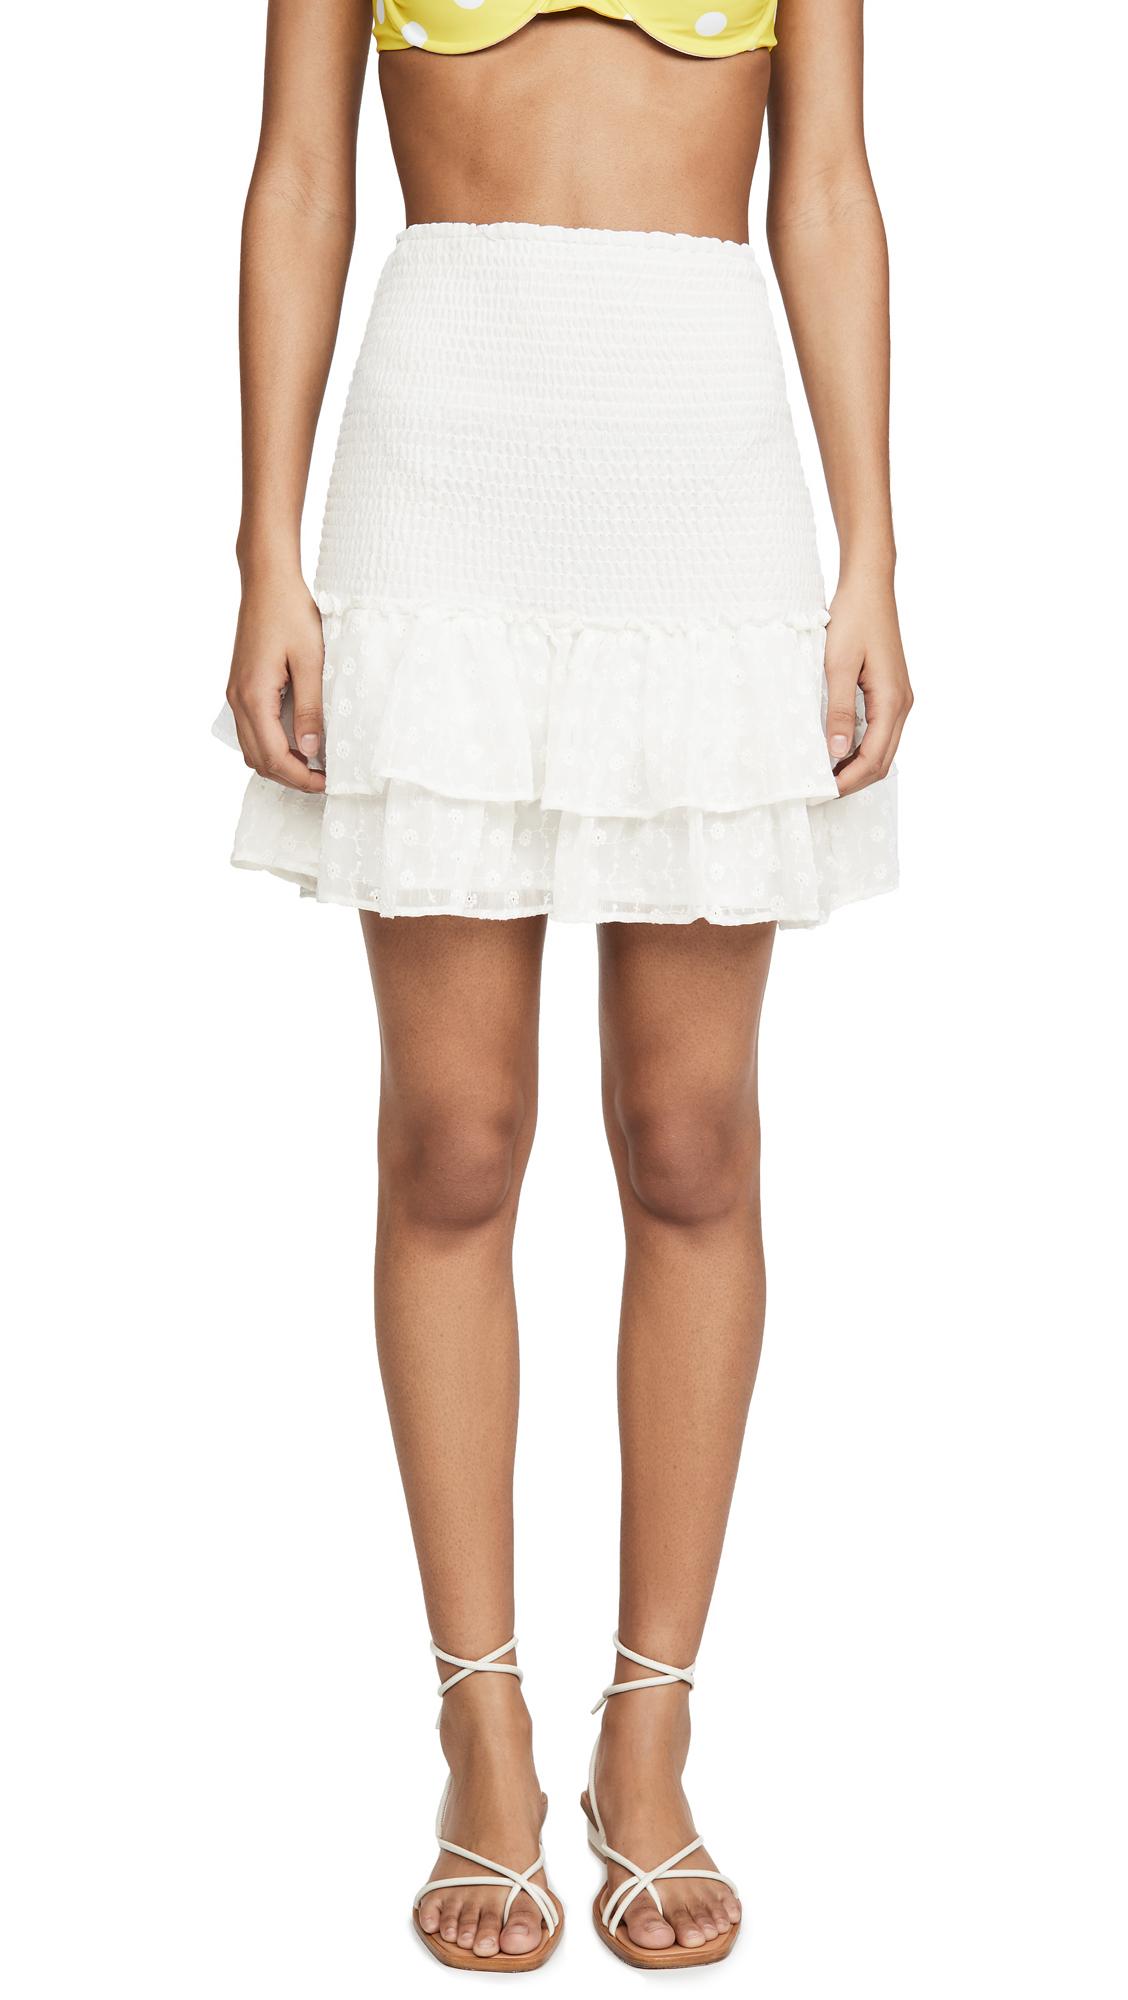 BB Dakota Girl Meets Ruffle Skirt